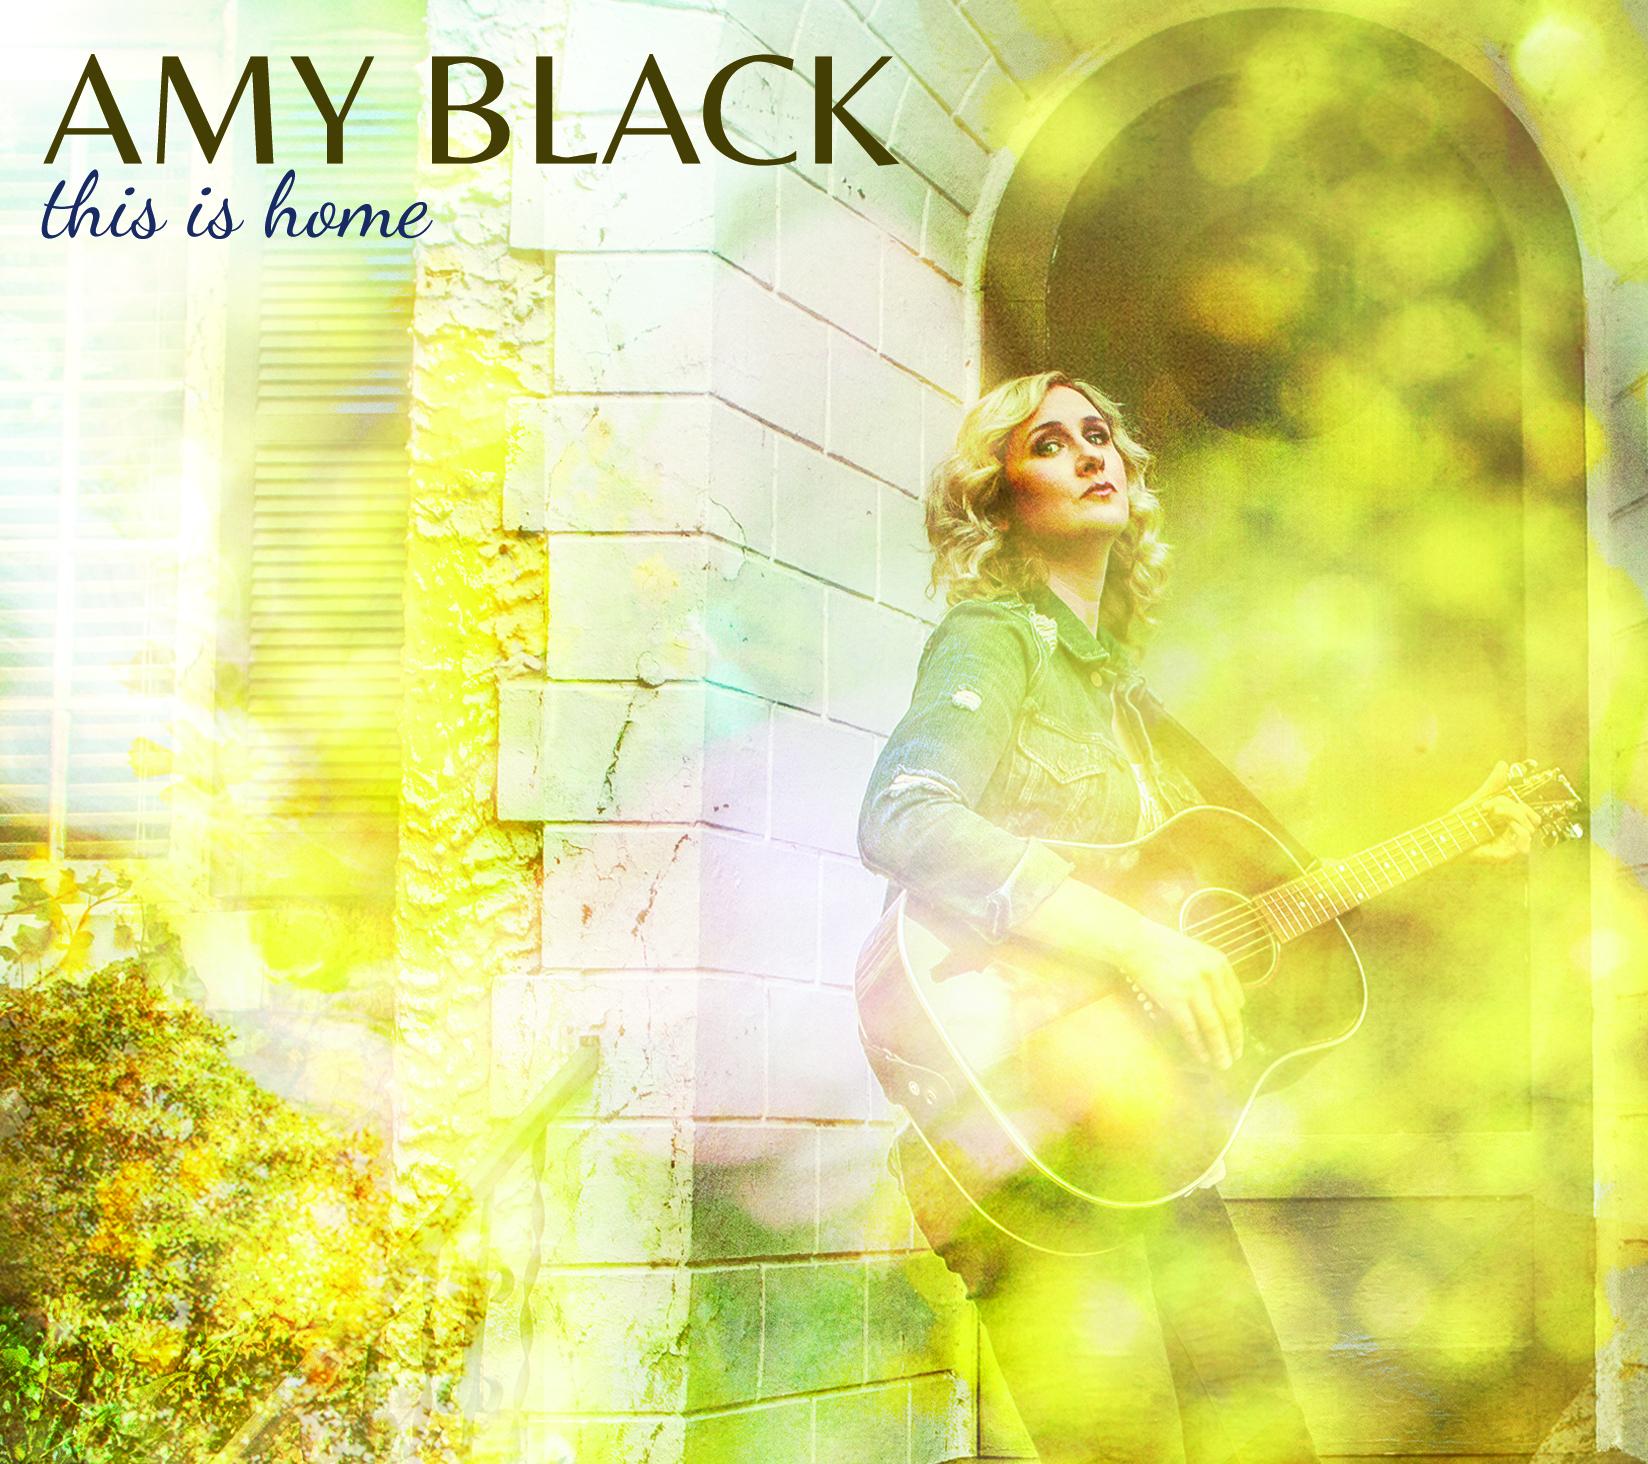 Amy Black